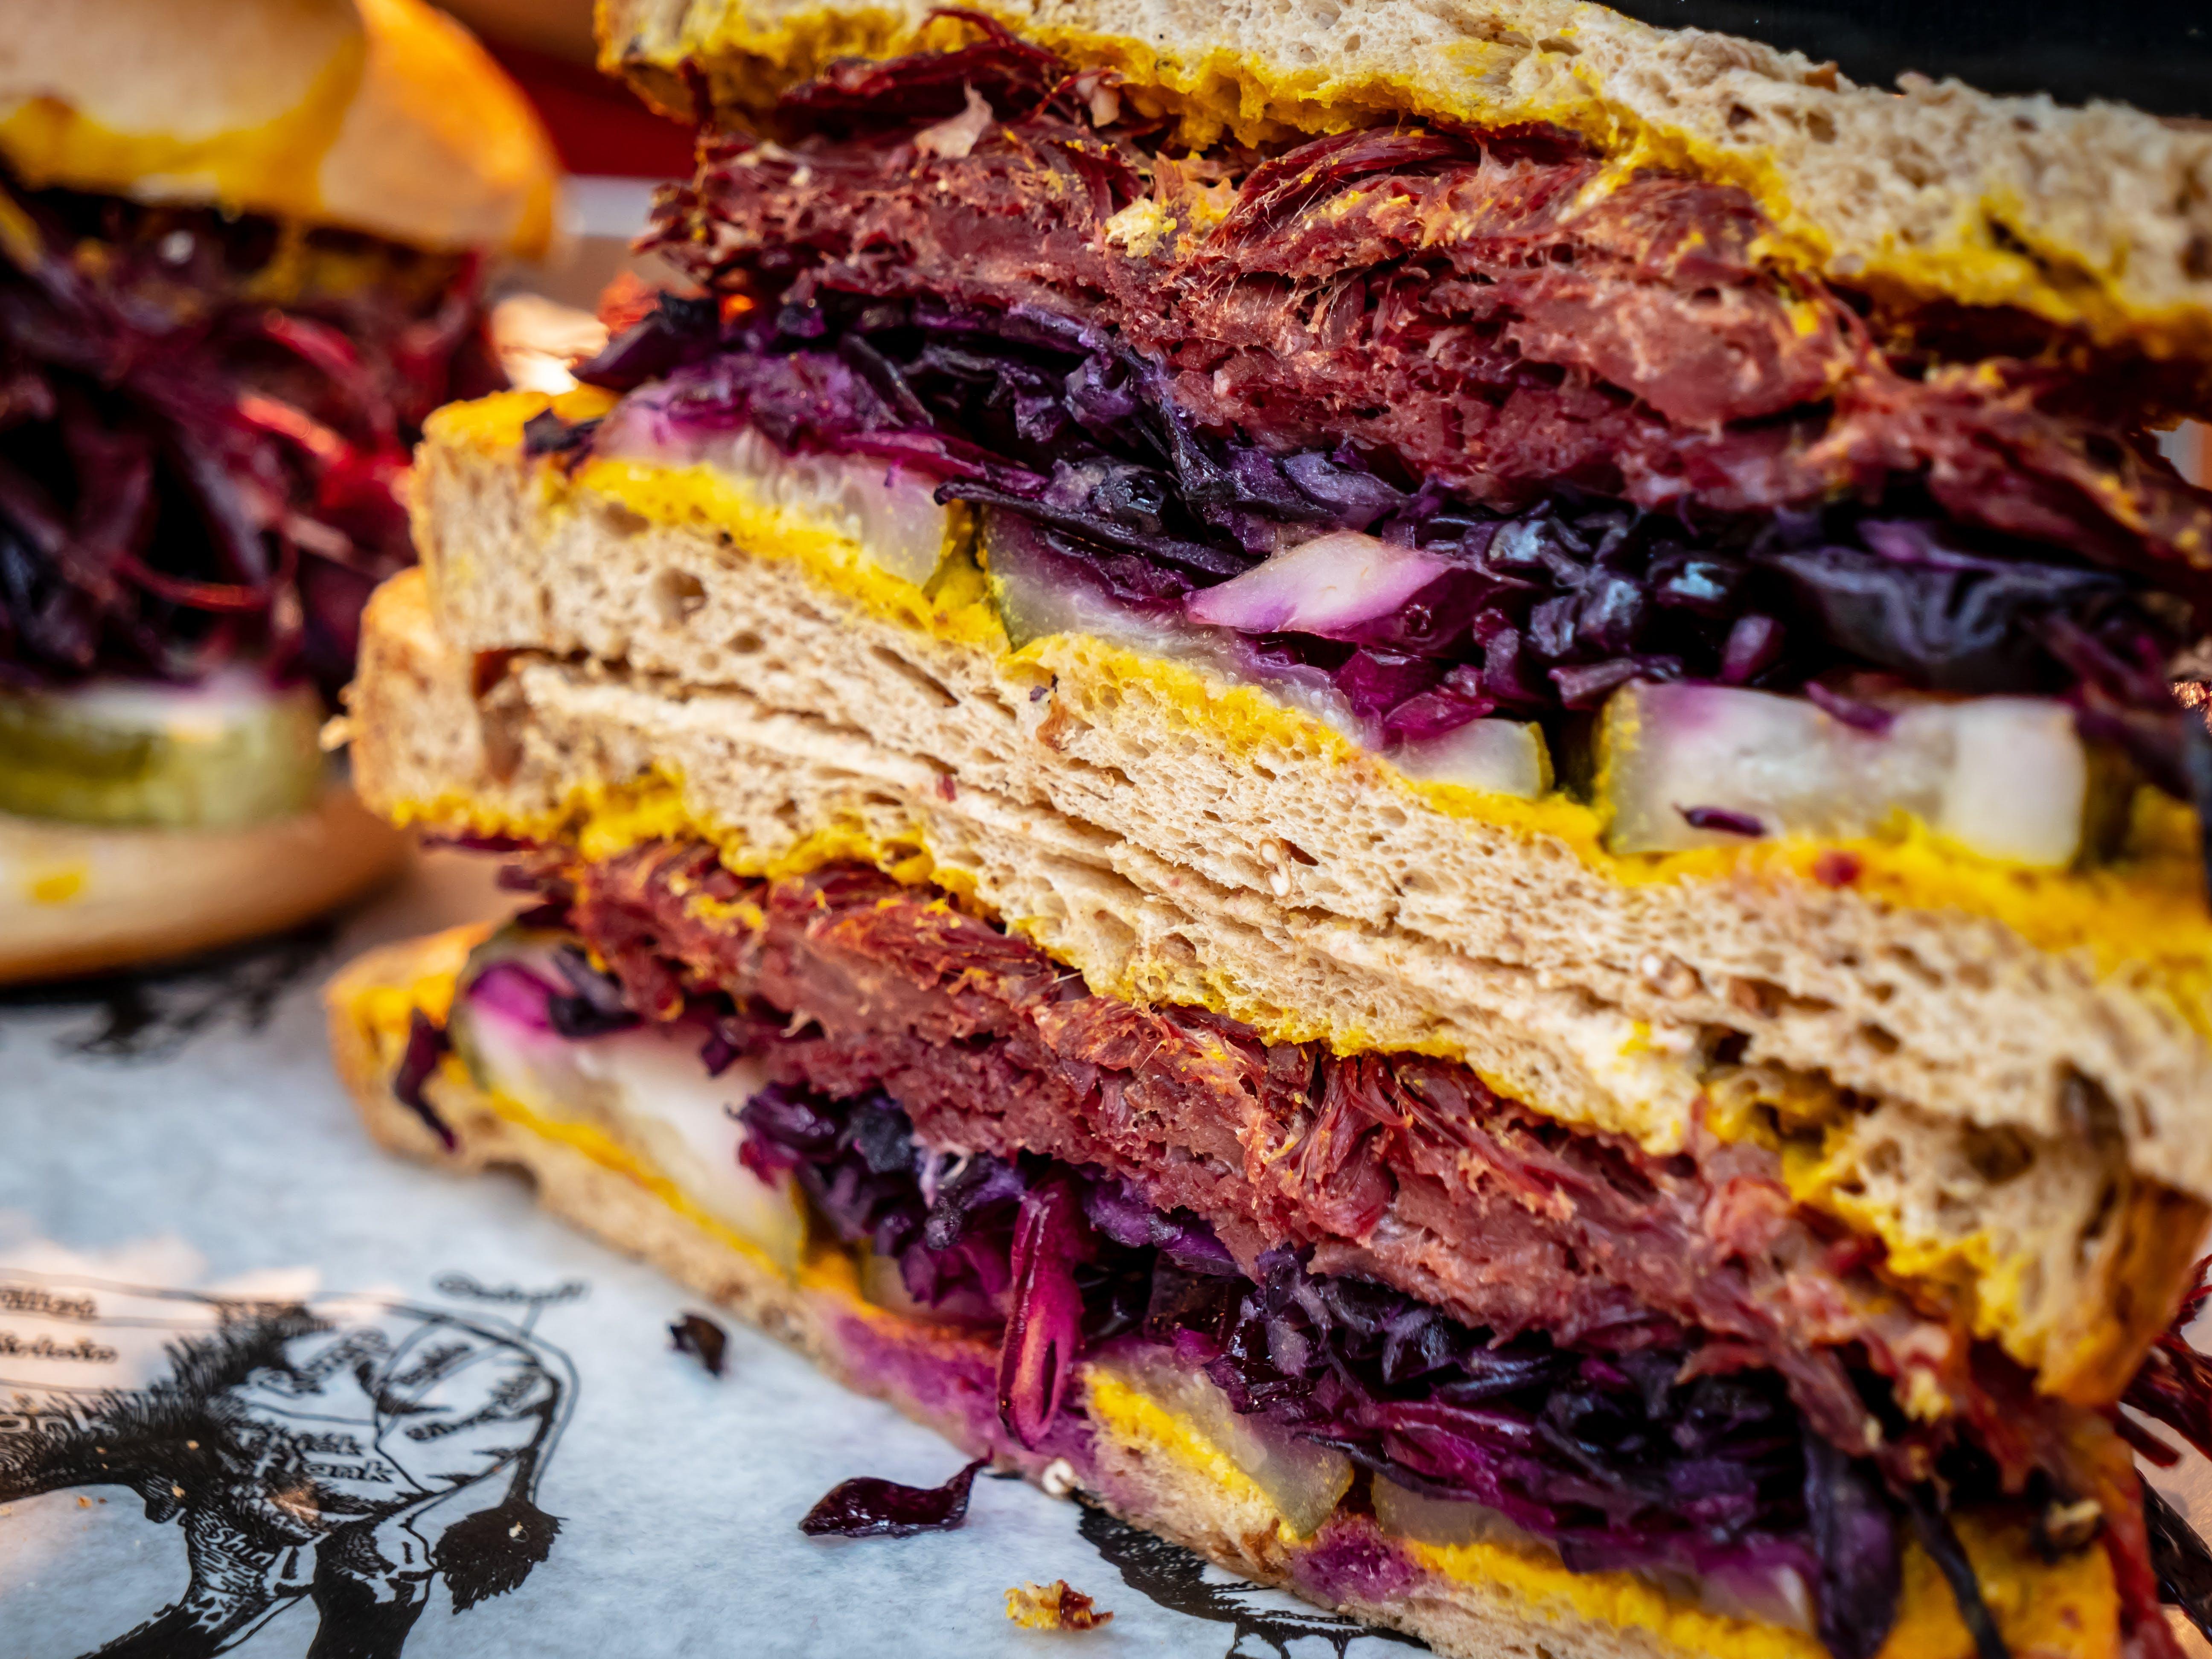 Fotos de stock gratuitas de apetecible, carne, carne de res, carne salada